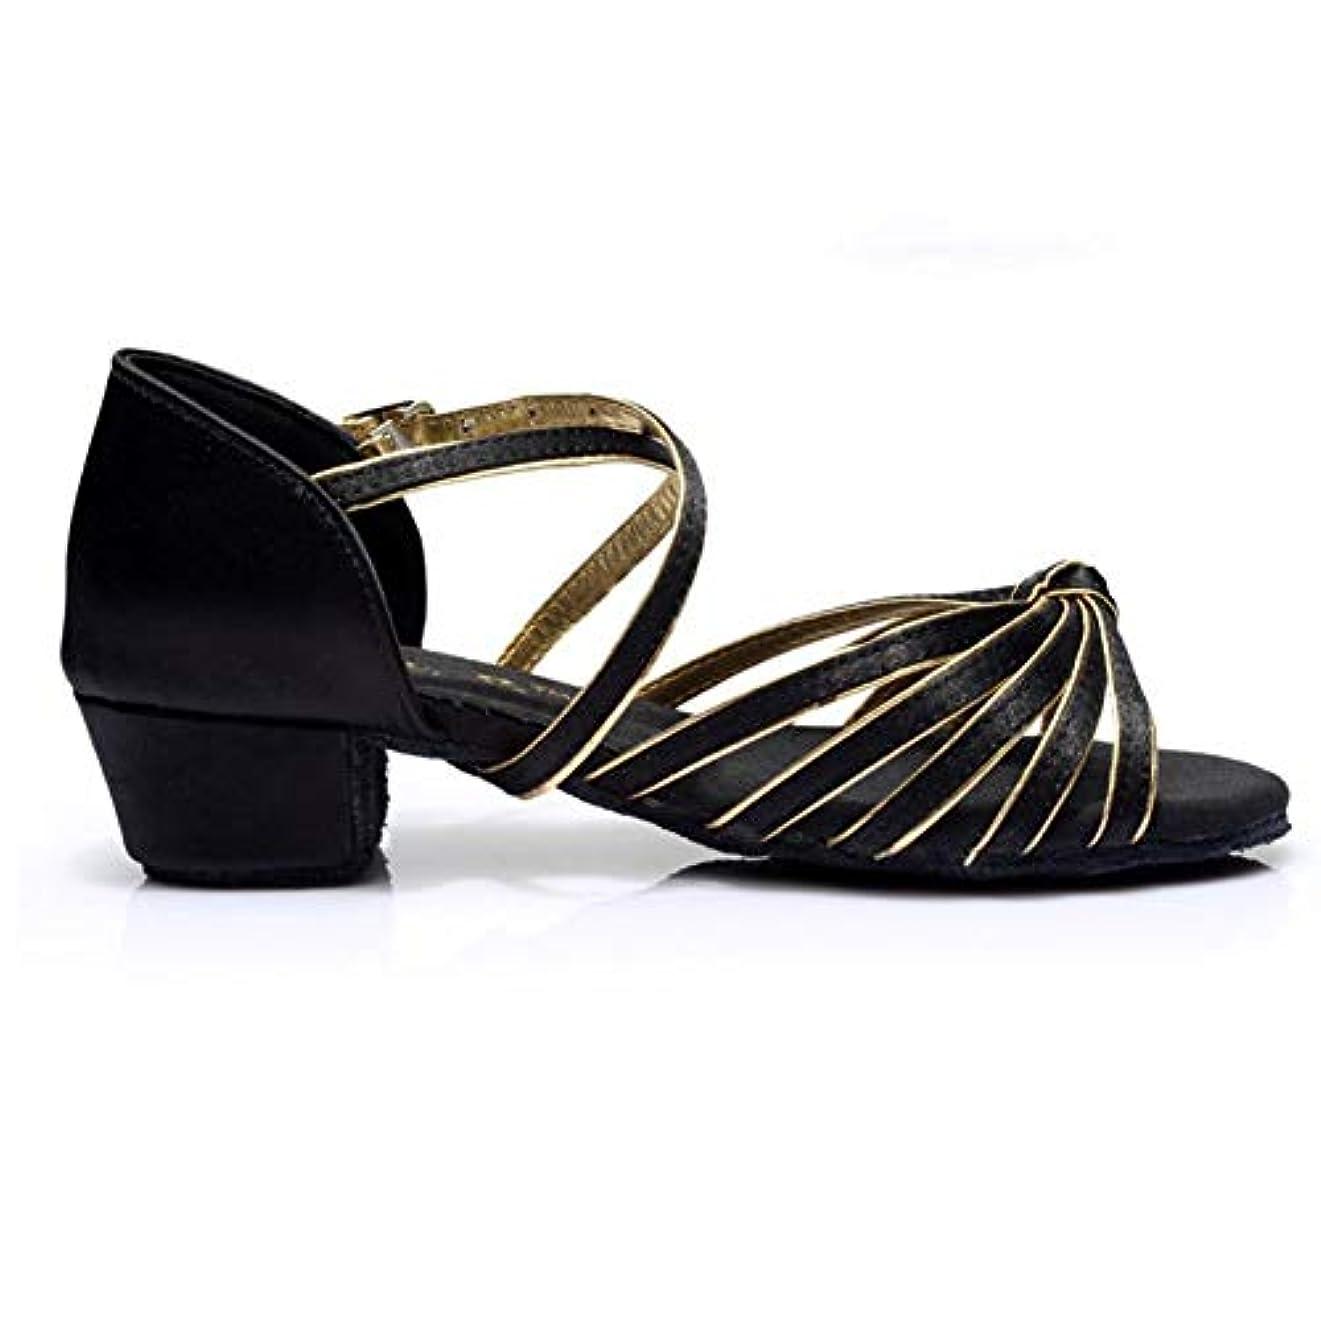 [Dianyejiancai] 最新の女性ダンスシューズ 女の子ラテンダンスシューズ、子供用ダンスシューズローヒール耐摩耗性サンダル (Color : C, サイズ : Foot length=20.3CM(8Inch))